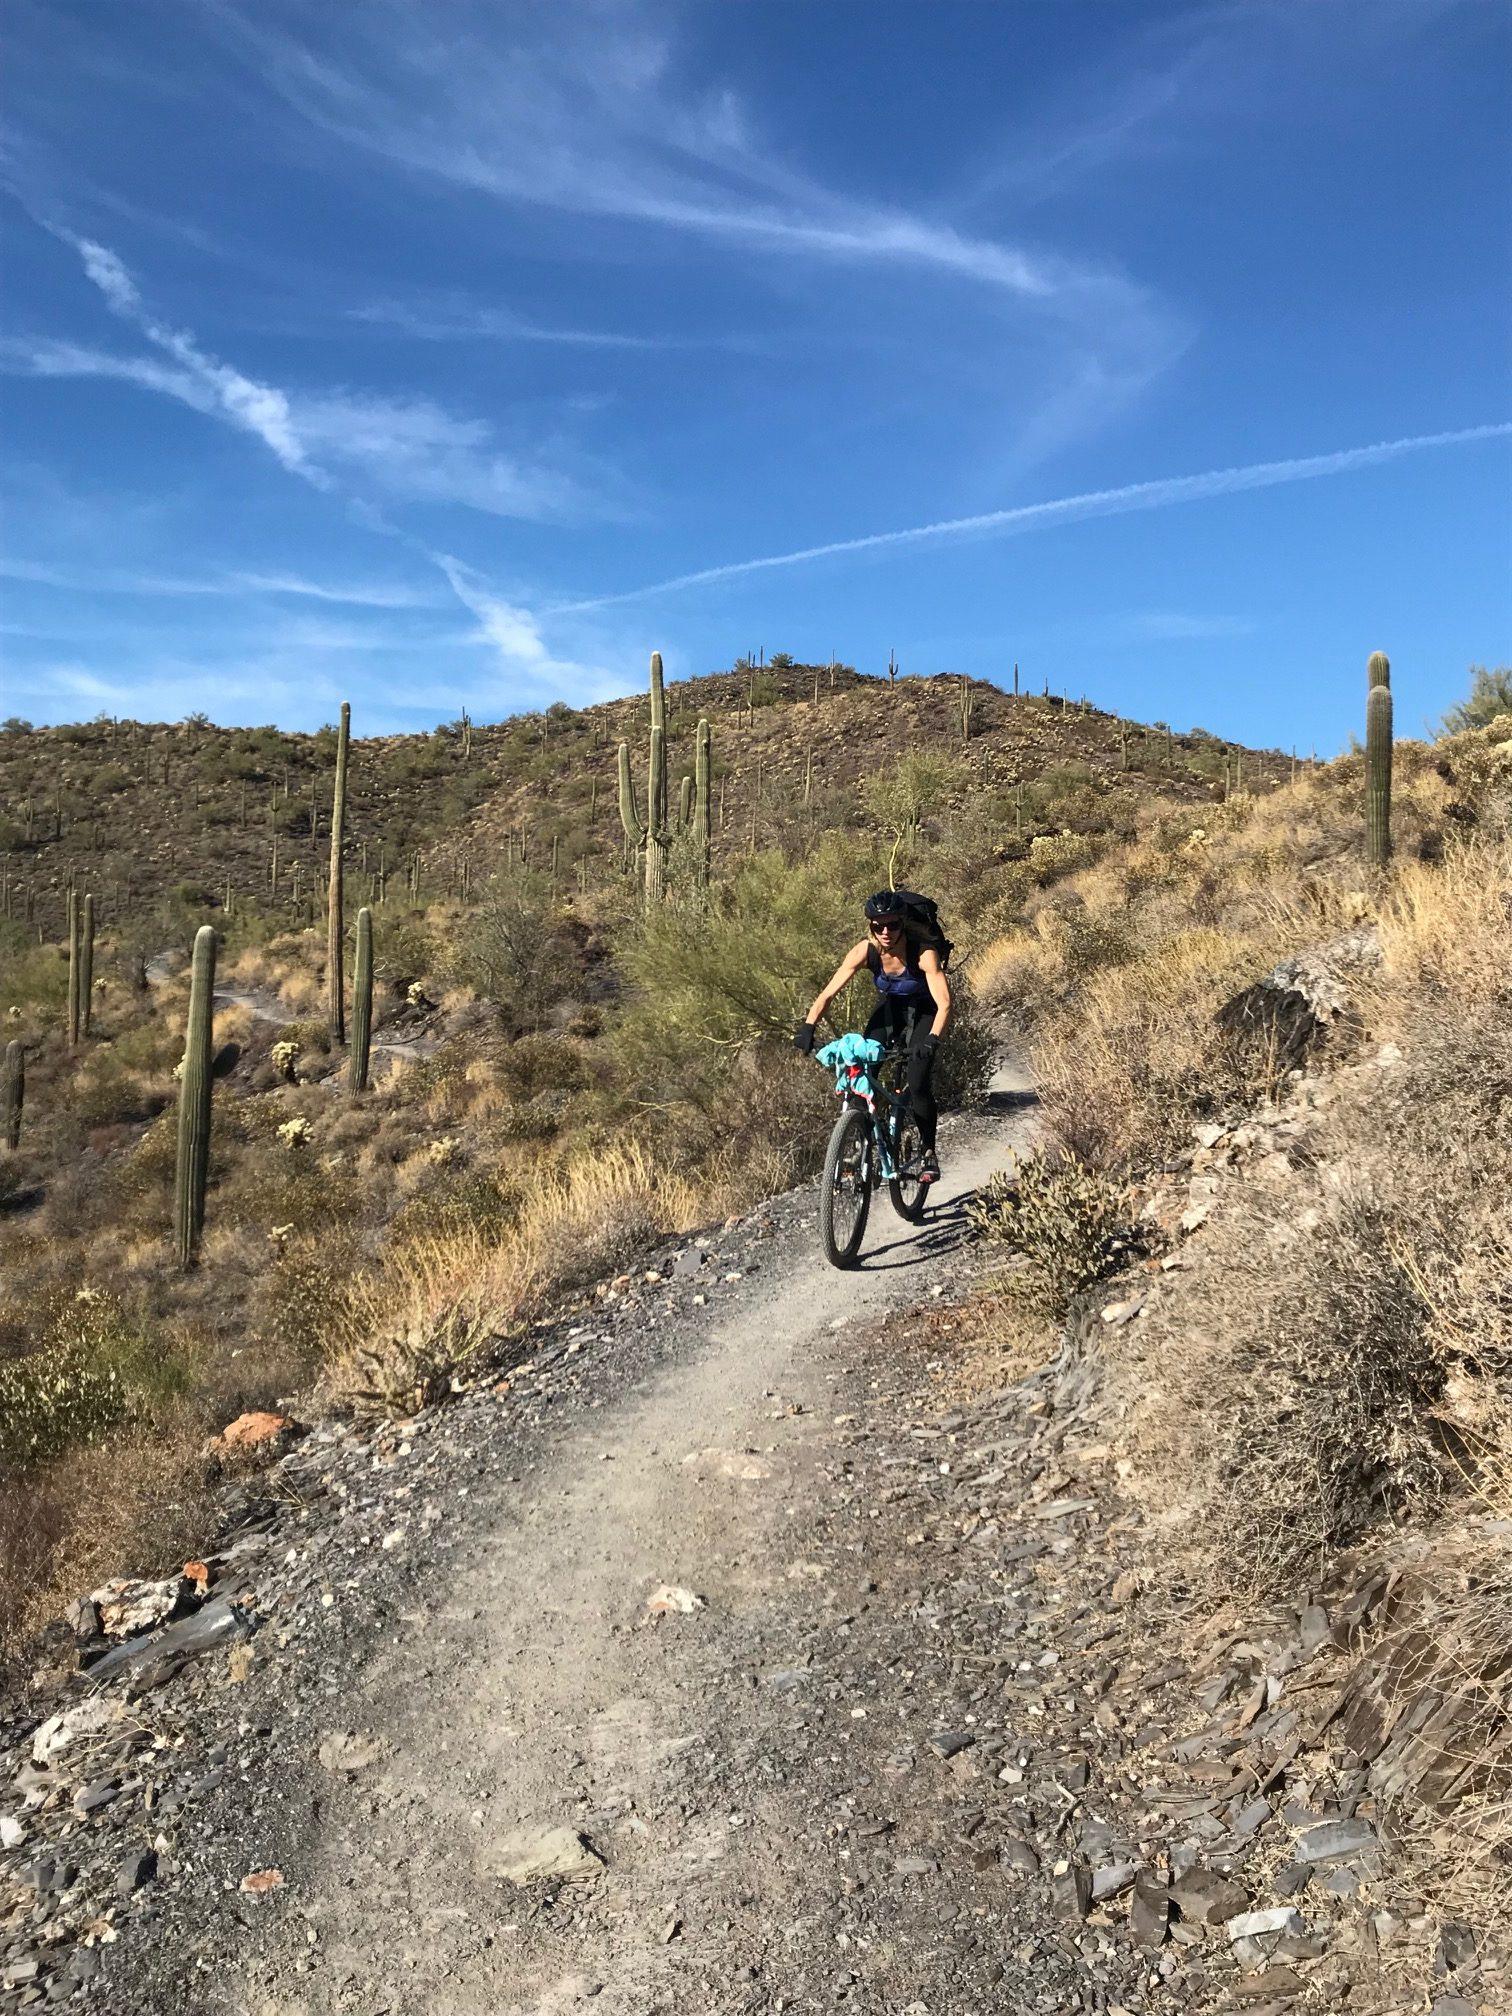 Cross training in AZ during winter